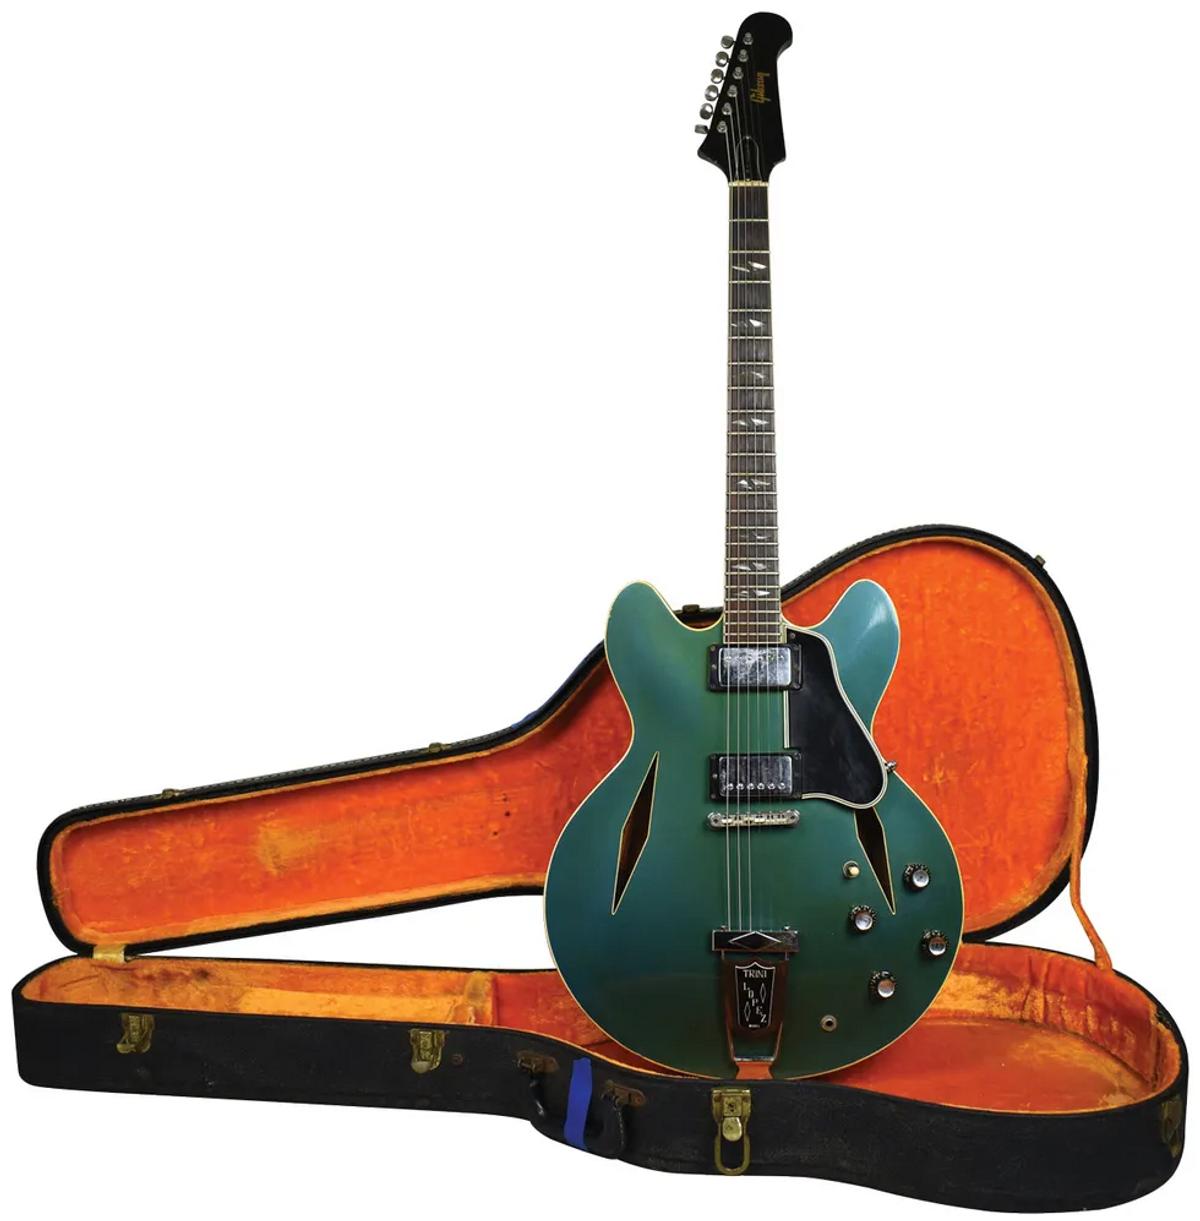 Vintage Vault: 1967 Gibson Trini Lopez Standard